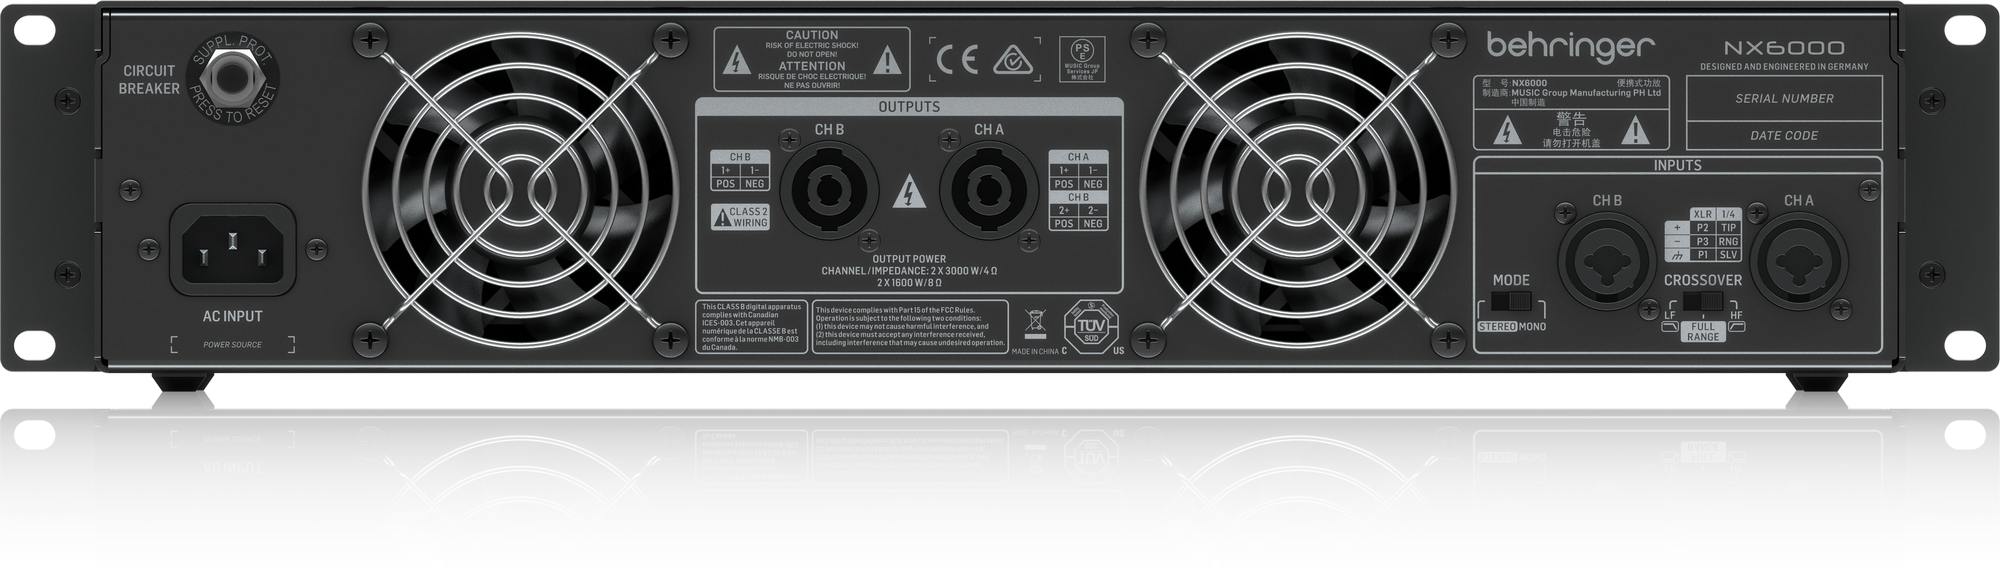 Behringer NX6000 - Power Amplifier